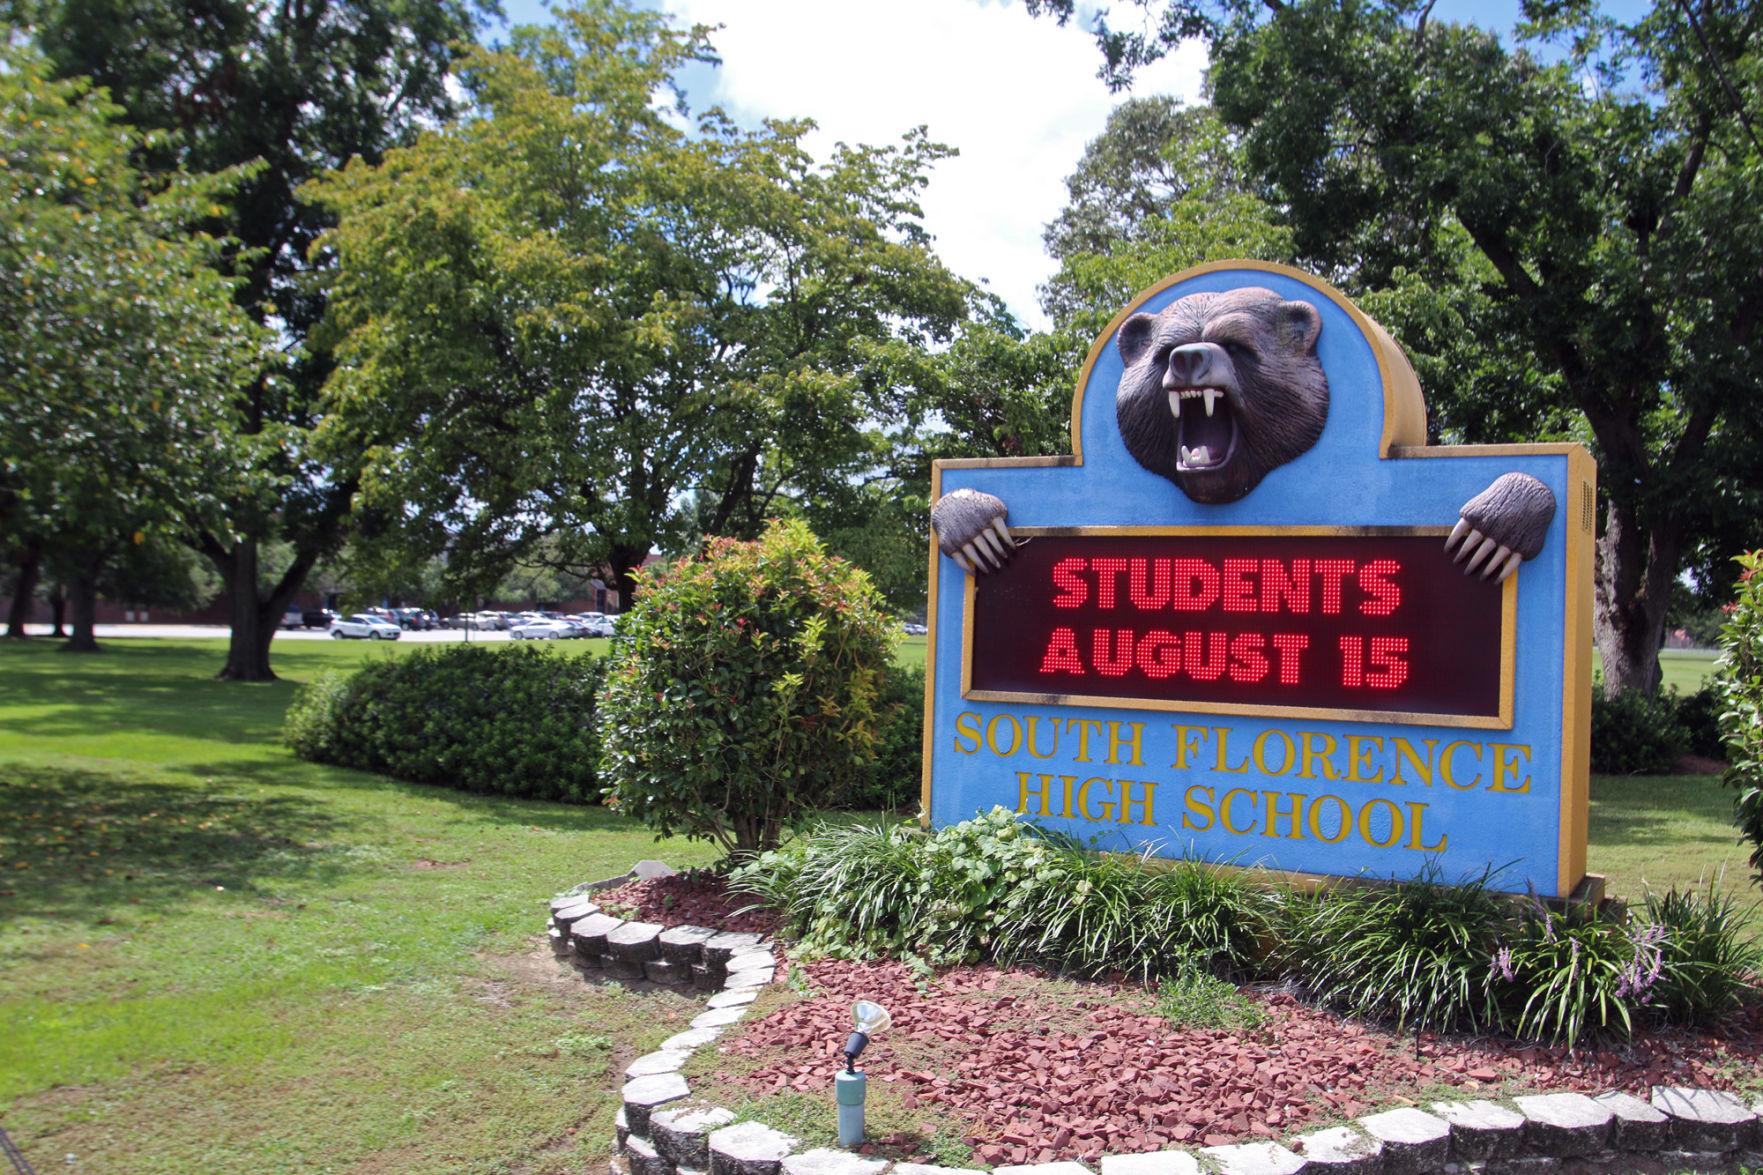 high school resume%0A South Florence High School